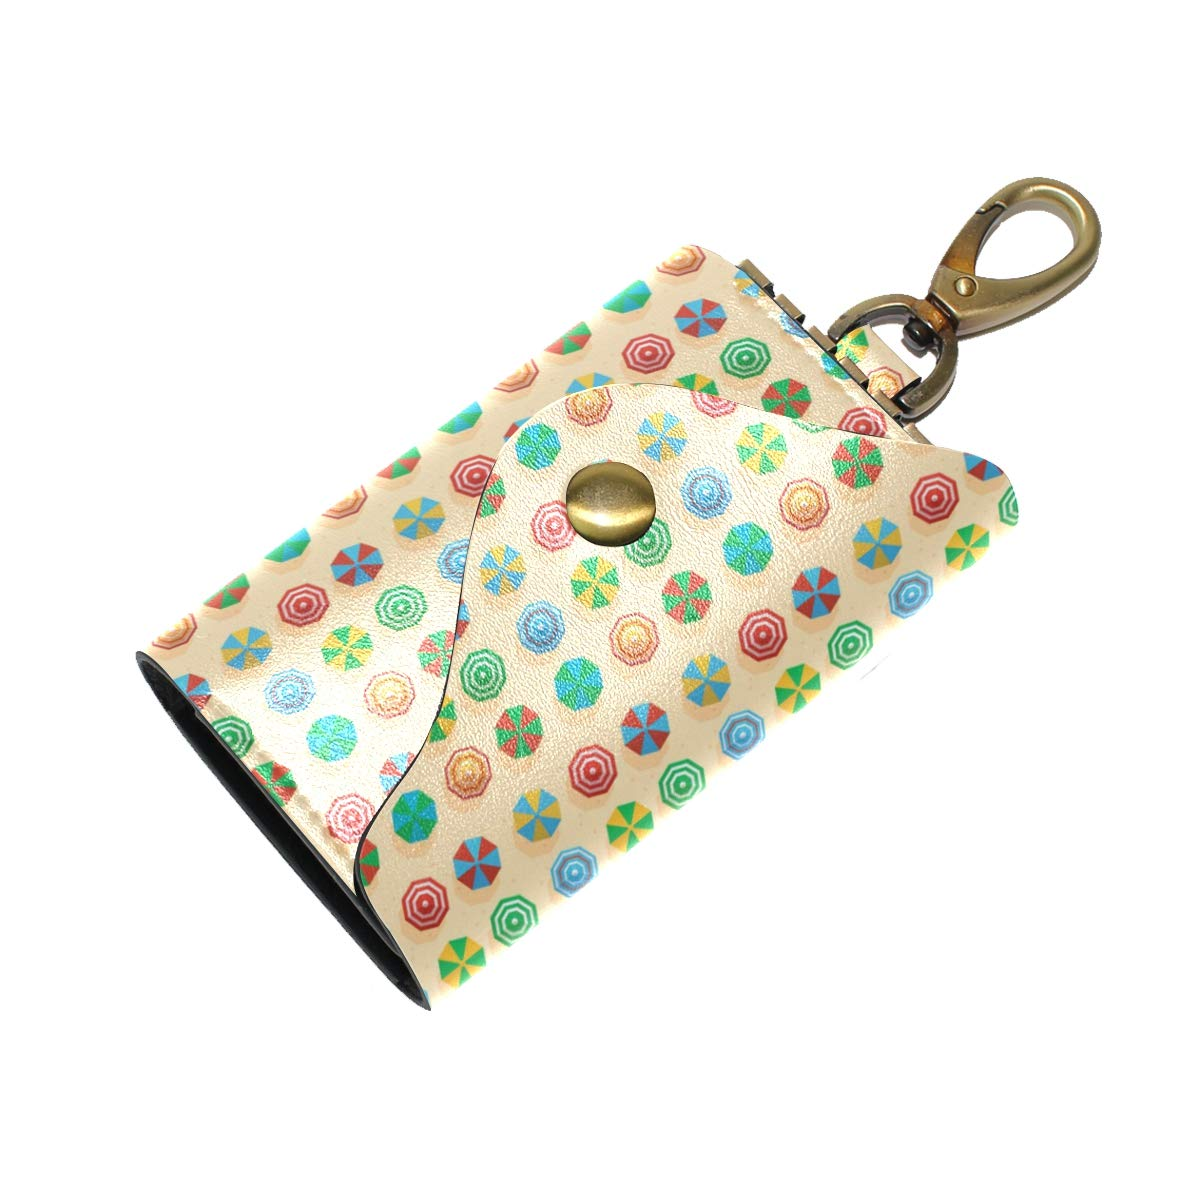 KEAKIA Umbrellas Pattern Leather Key Case Wallets Tri-fold Key Holder Keychains with 6 Hooks 2 Slot Snap Closure for Men Women